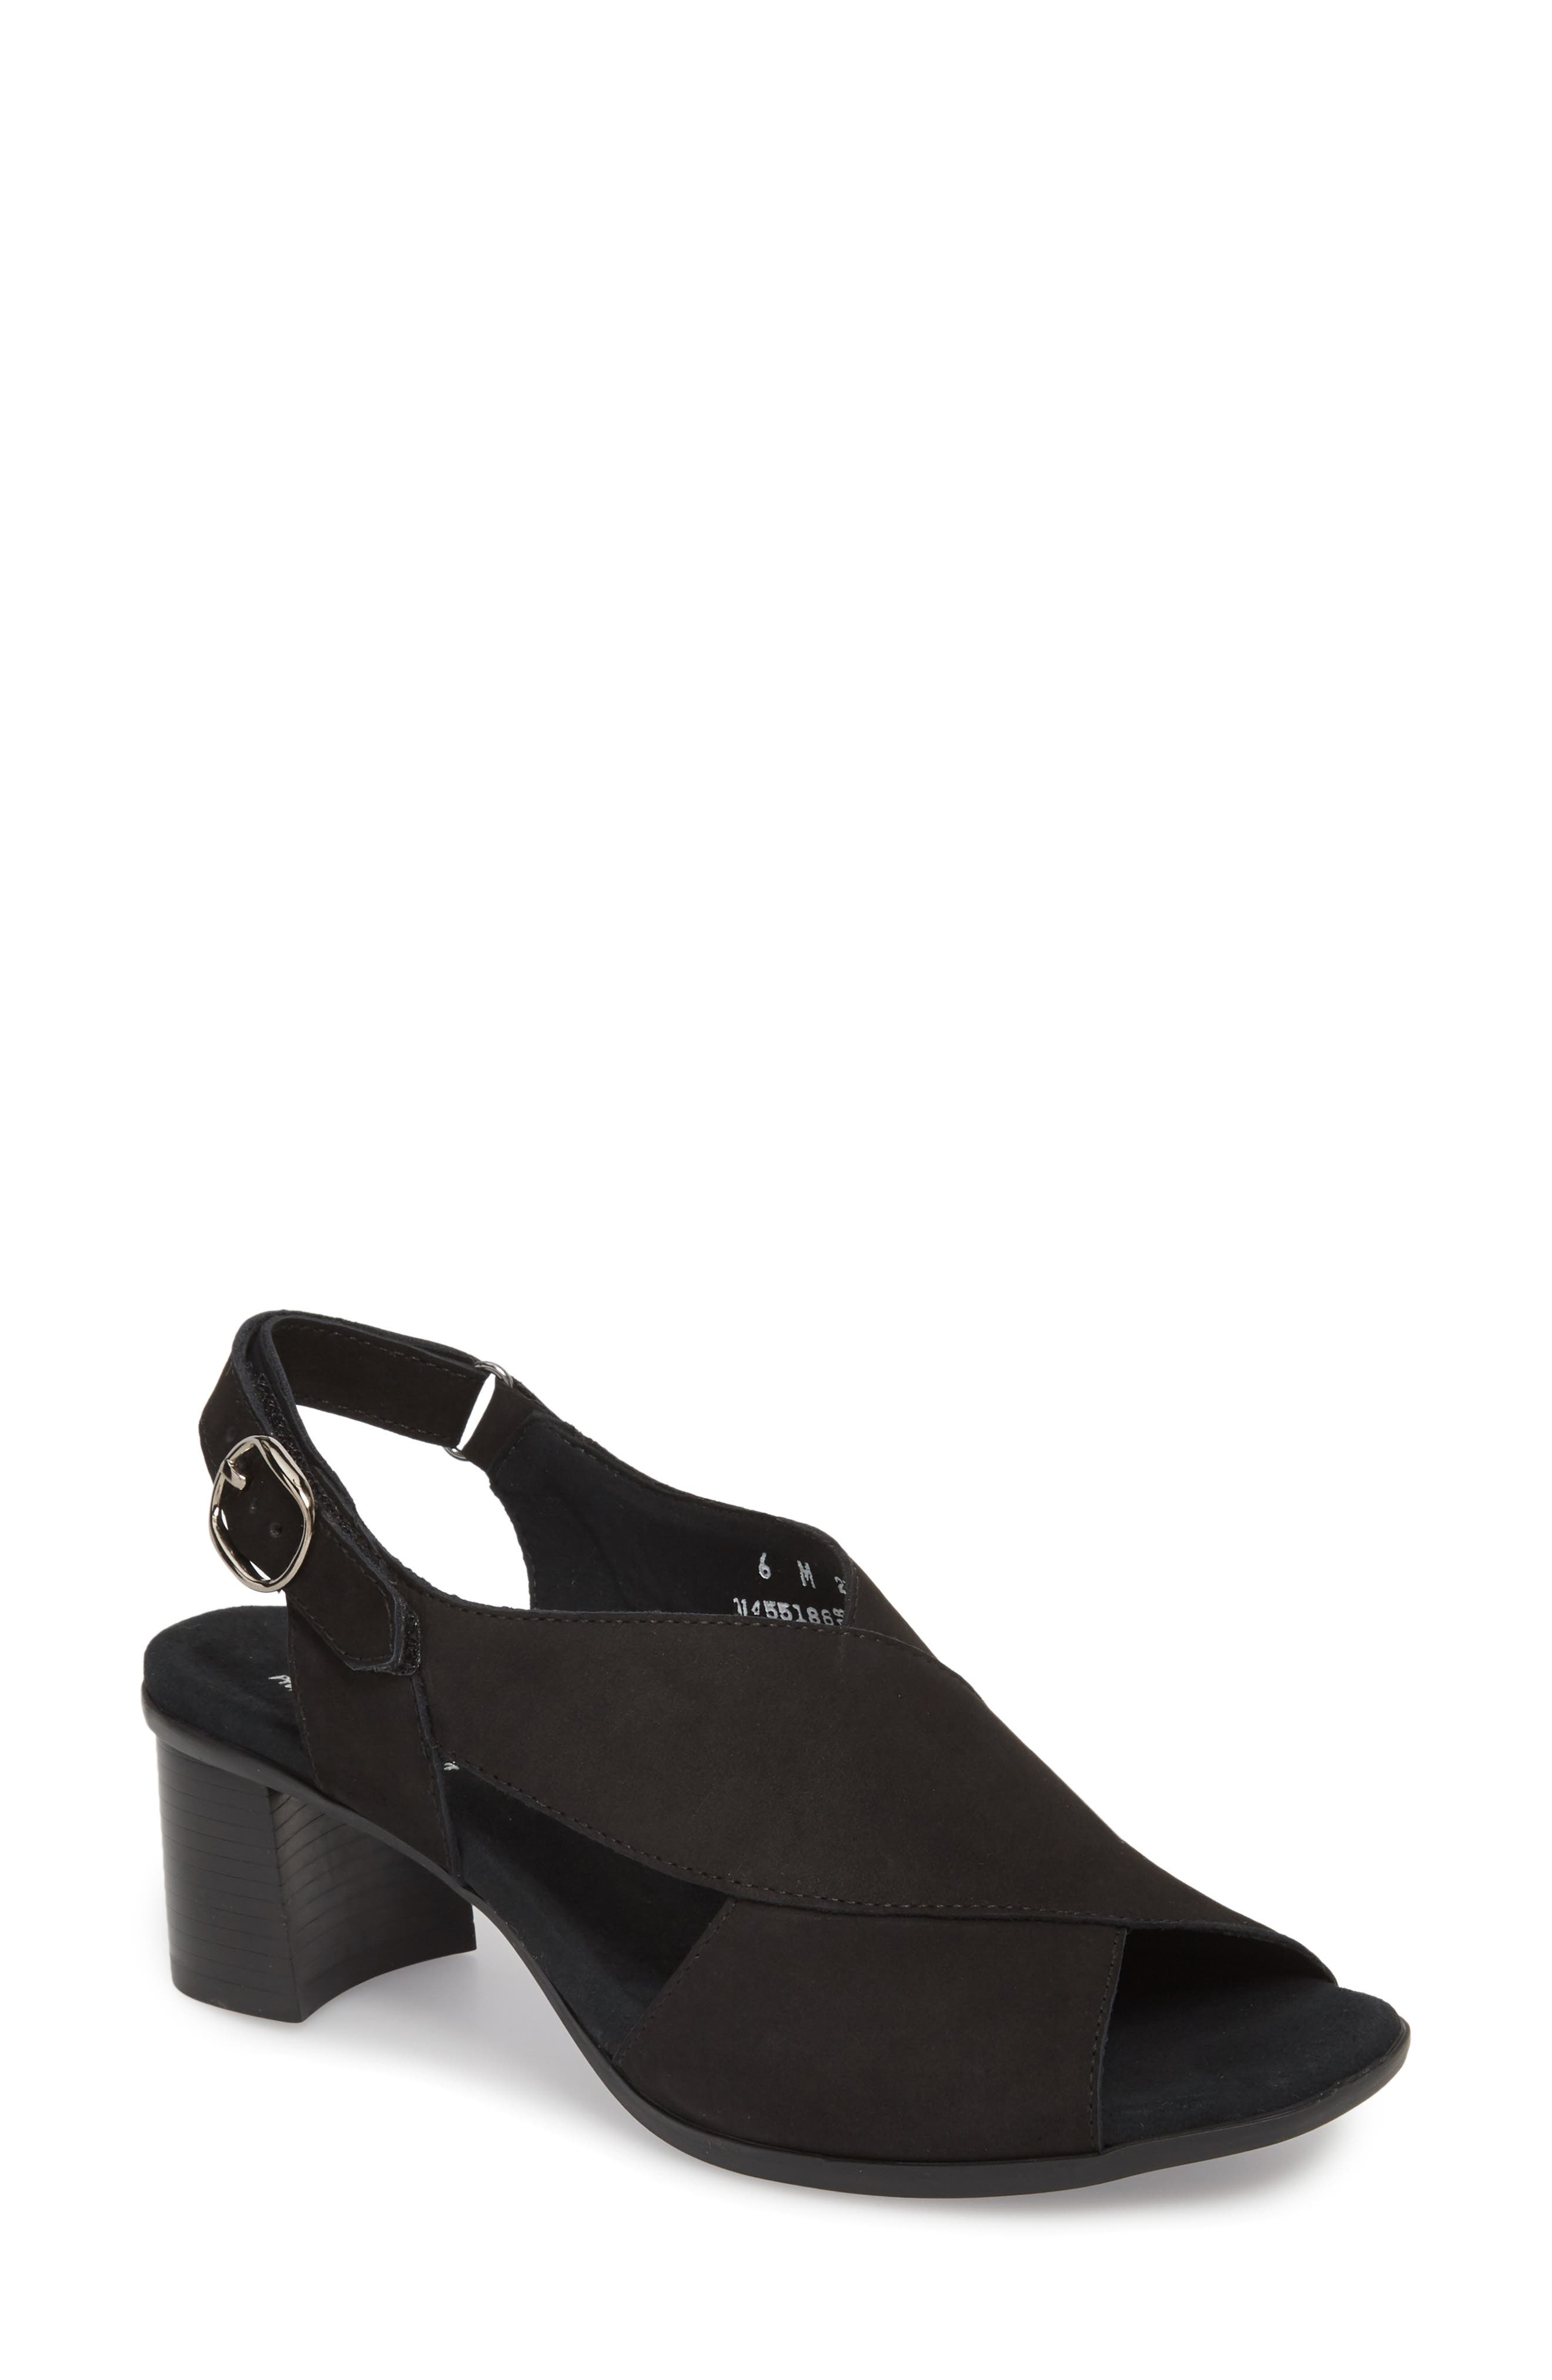 Laine Block Heel Sandal,                             Main thumbnail 1, color,                             BLACK NUBUCK LEATHER